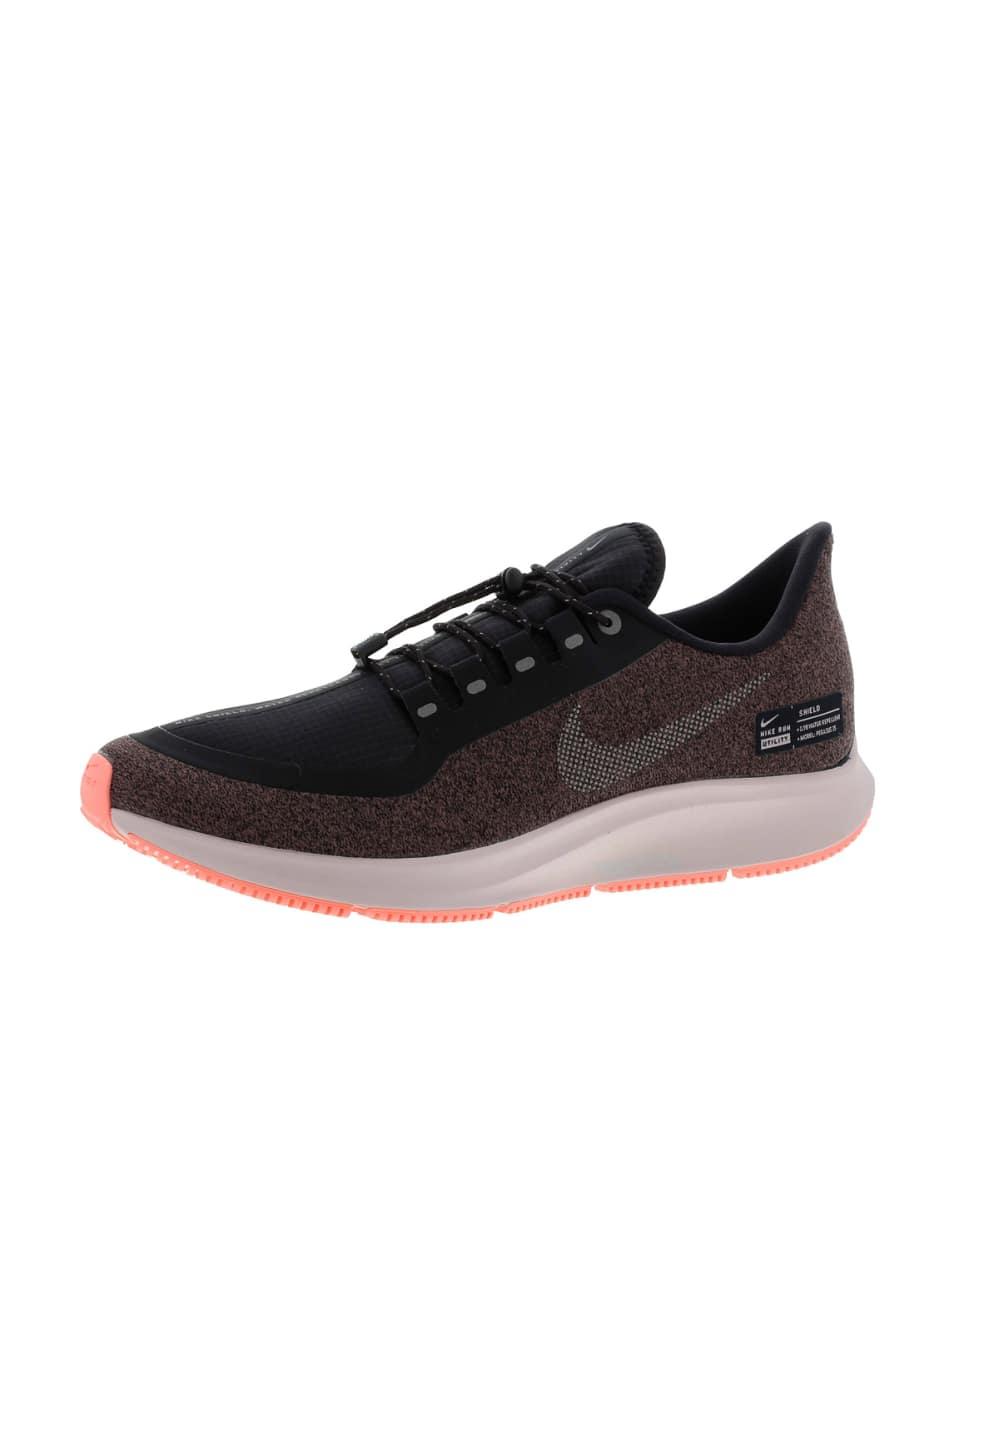 best website 151e1 9e3cf Nike Air Zoom Pegasus 35 Rn Shield - Running shoes for Women - Black